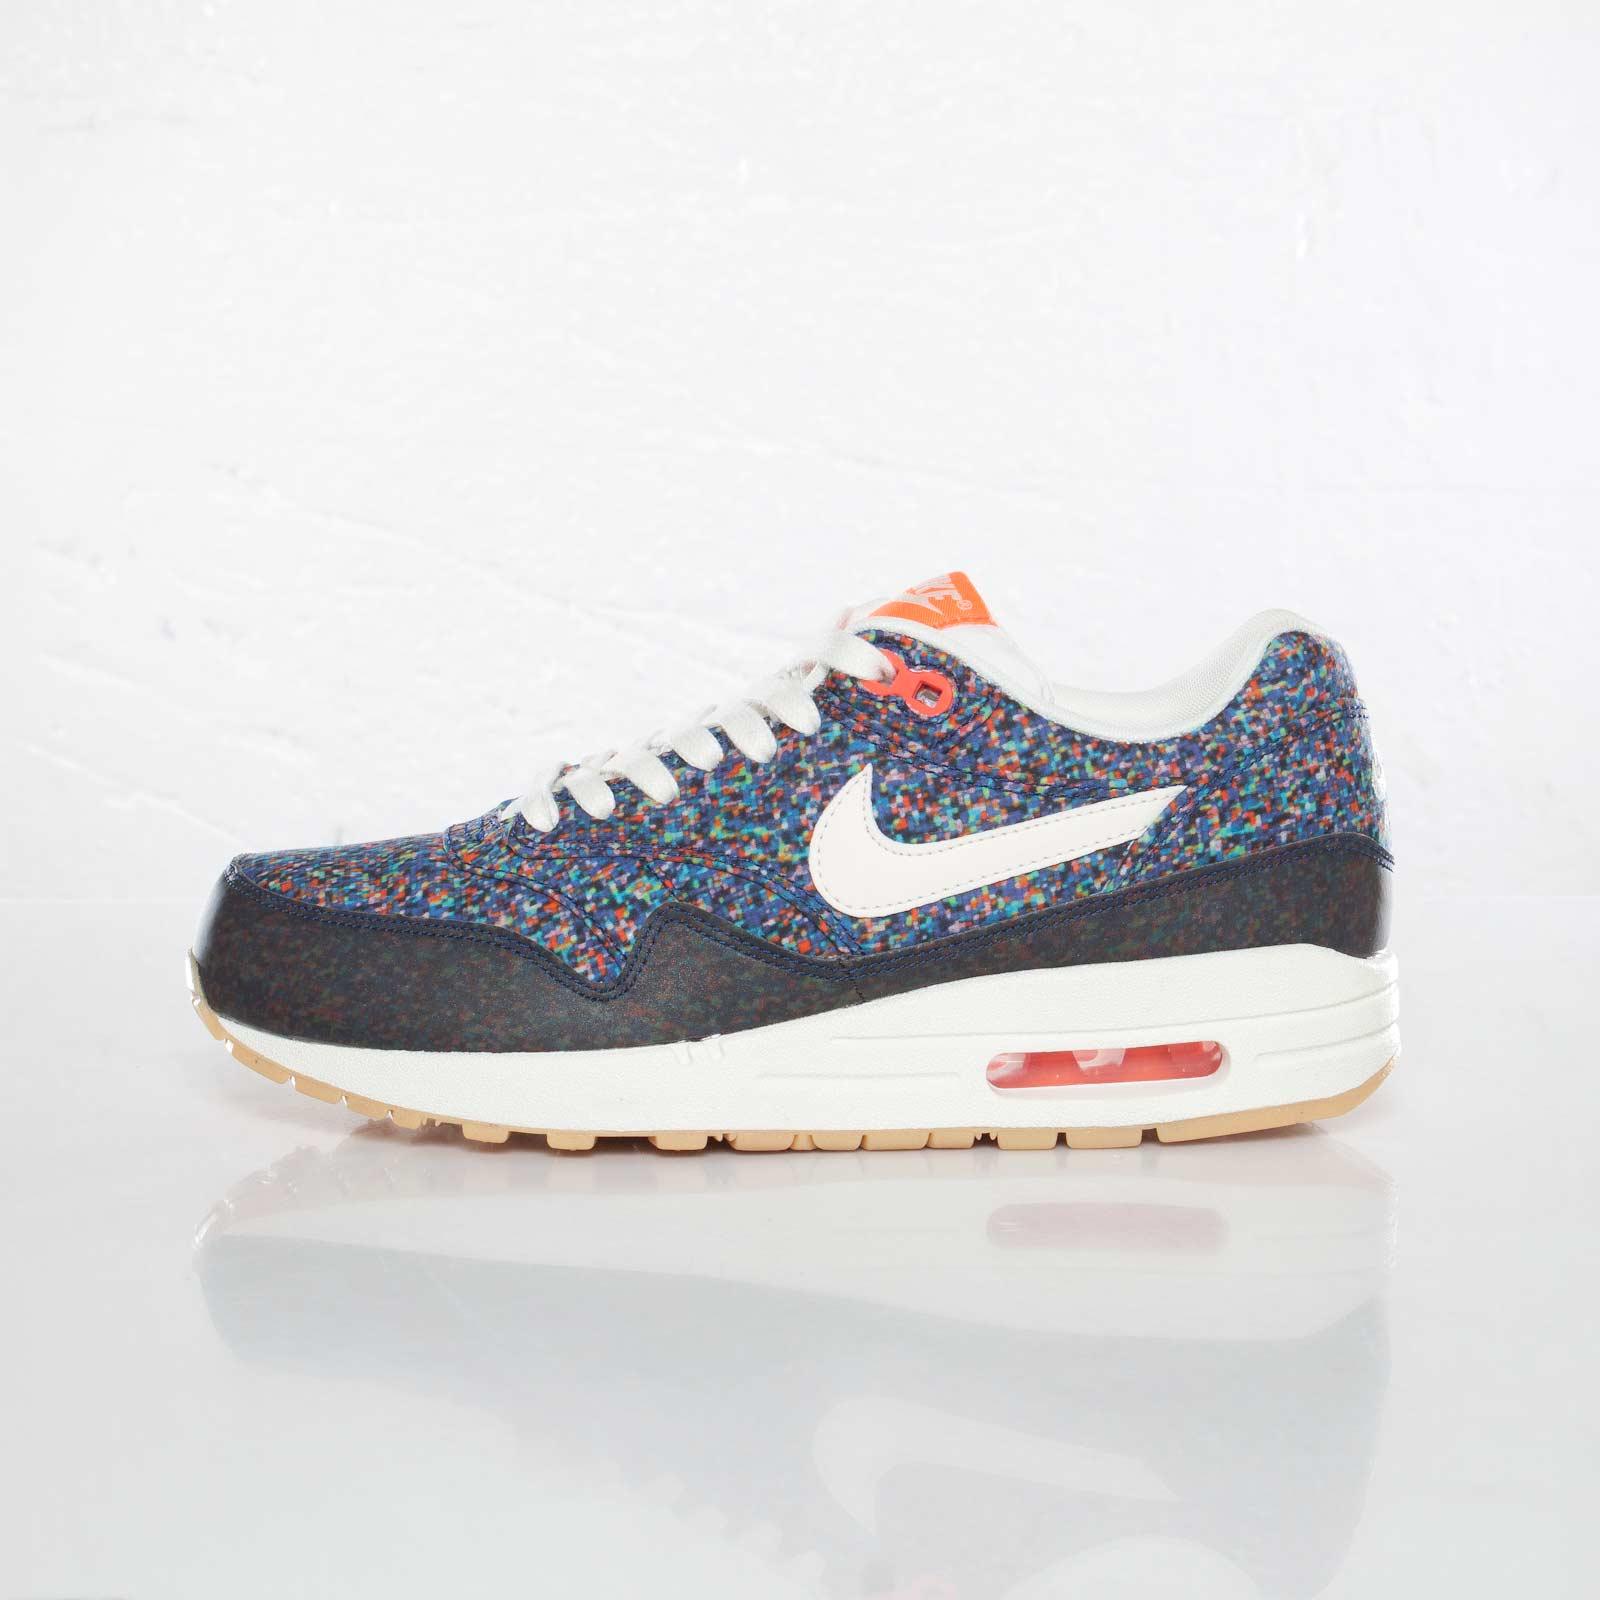 hot sale online 50903 d515d Nike Wmns Air Max 1 ND Liberty - 528712-400 - Sneakersnstuff   sneakers    streetwear online since 1999